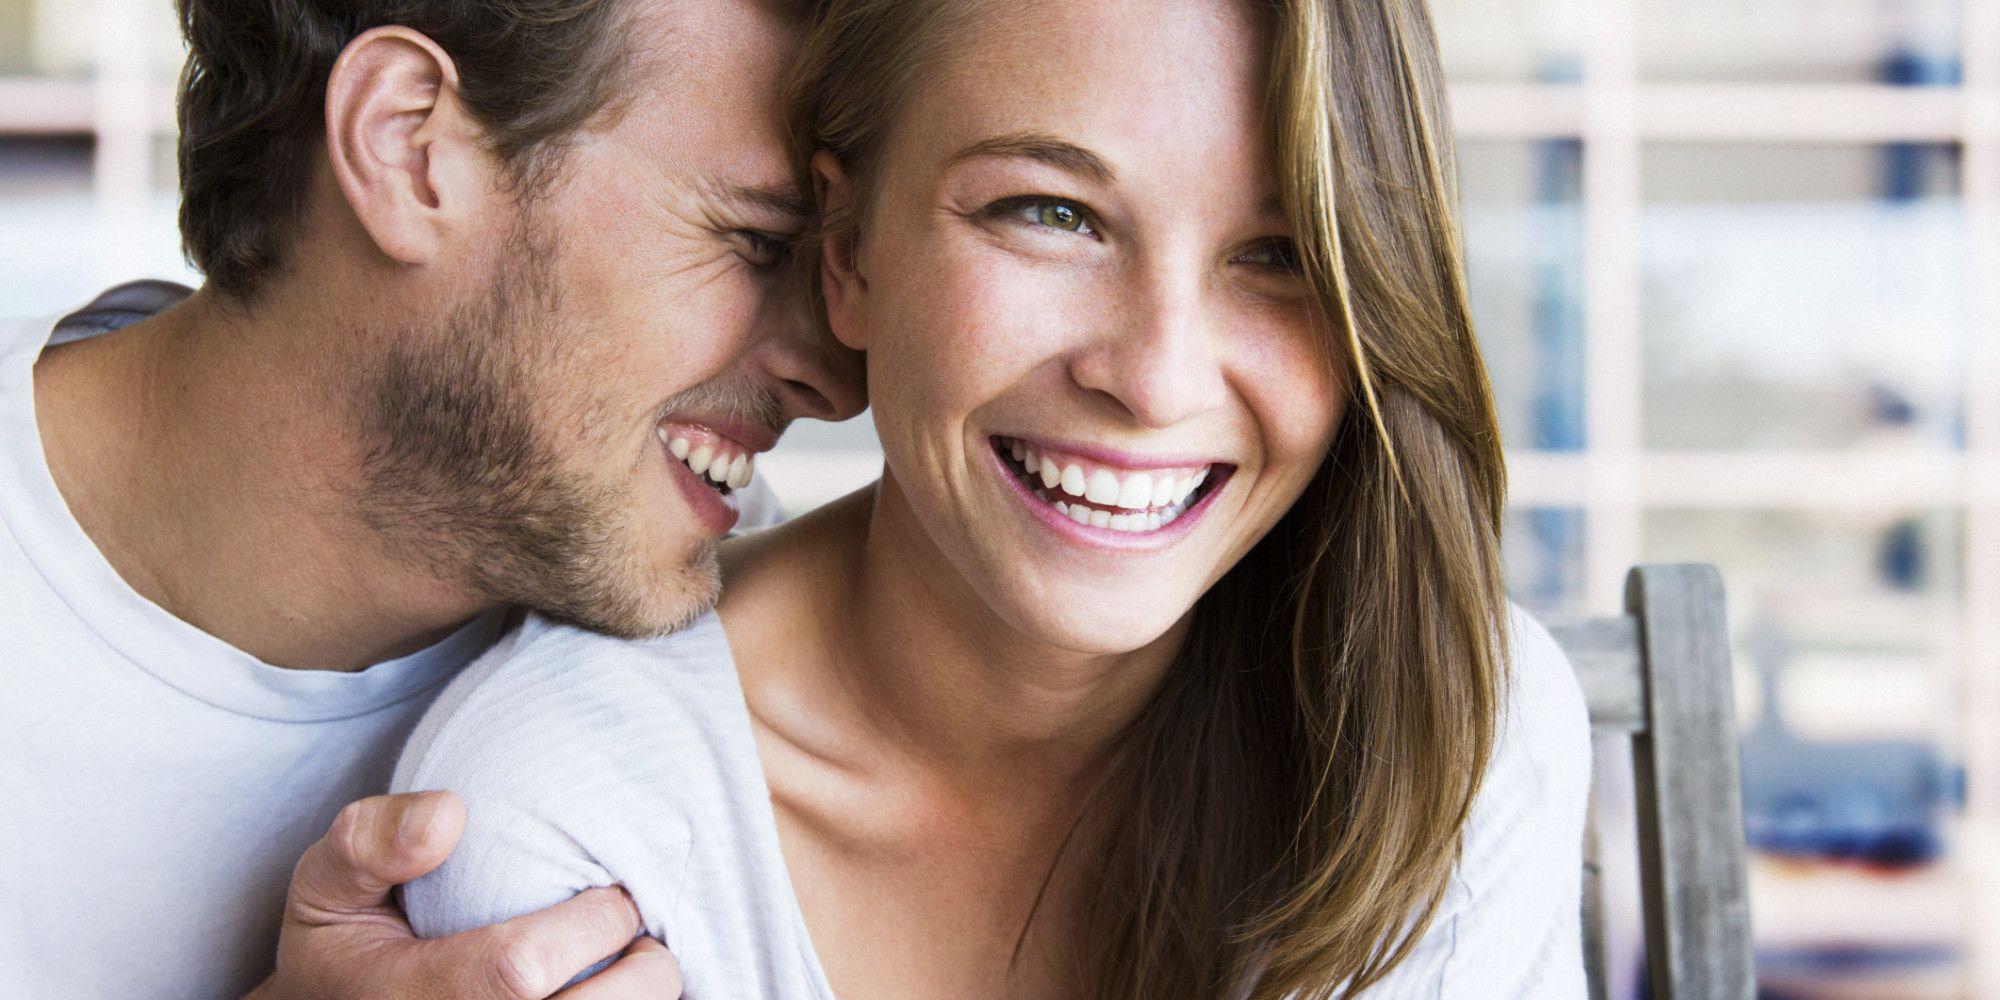 Terapia par podczas randek